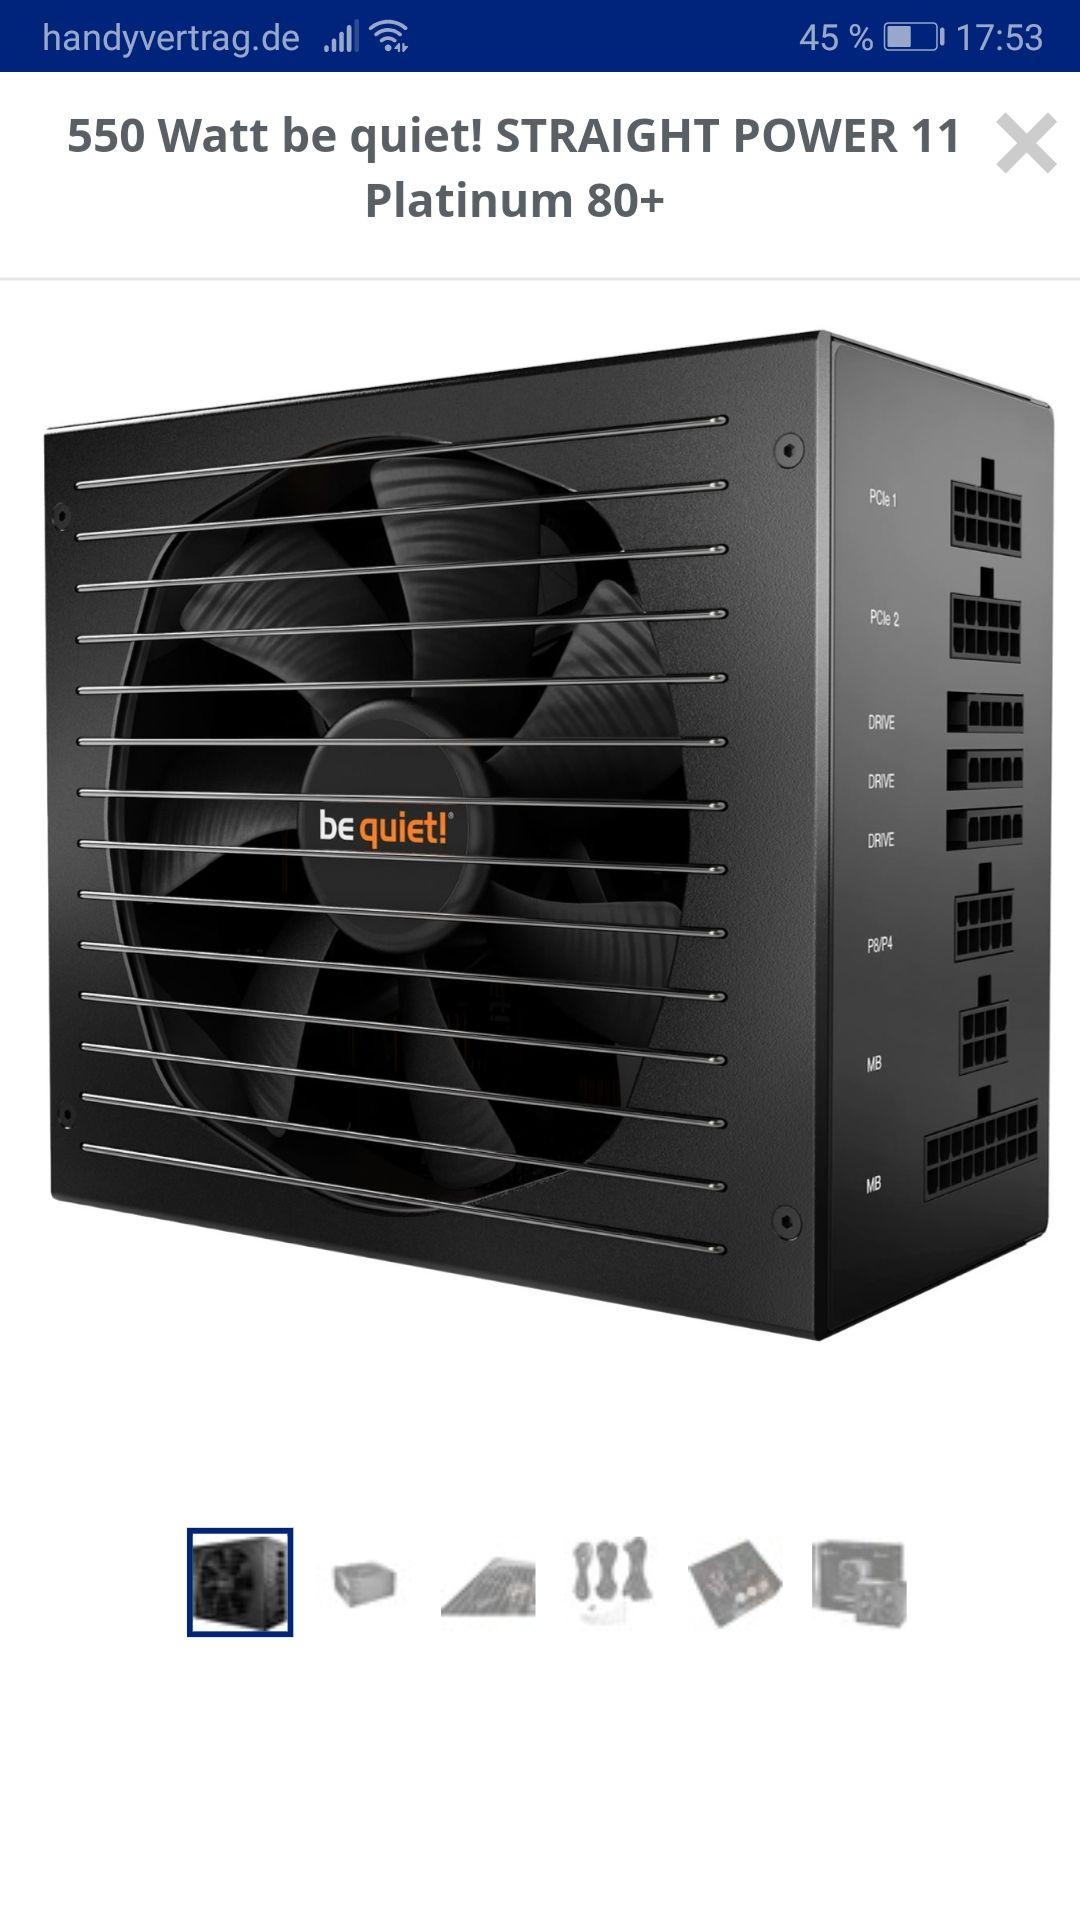 550 Watt be quiet! STRAIGHT POWER 11 Platinum 80+ (Mindstar)